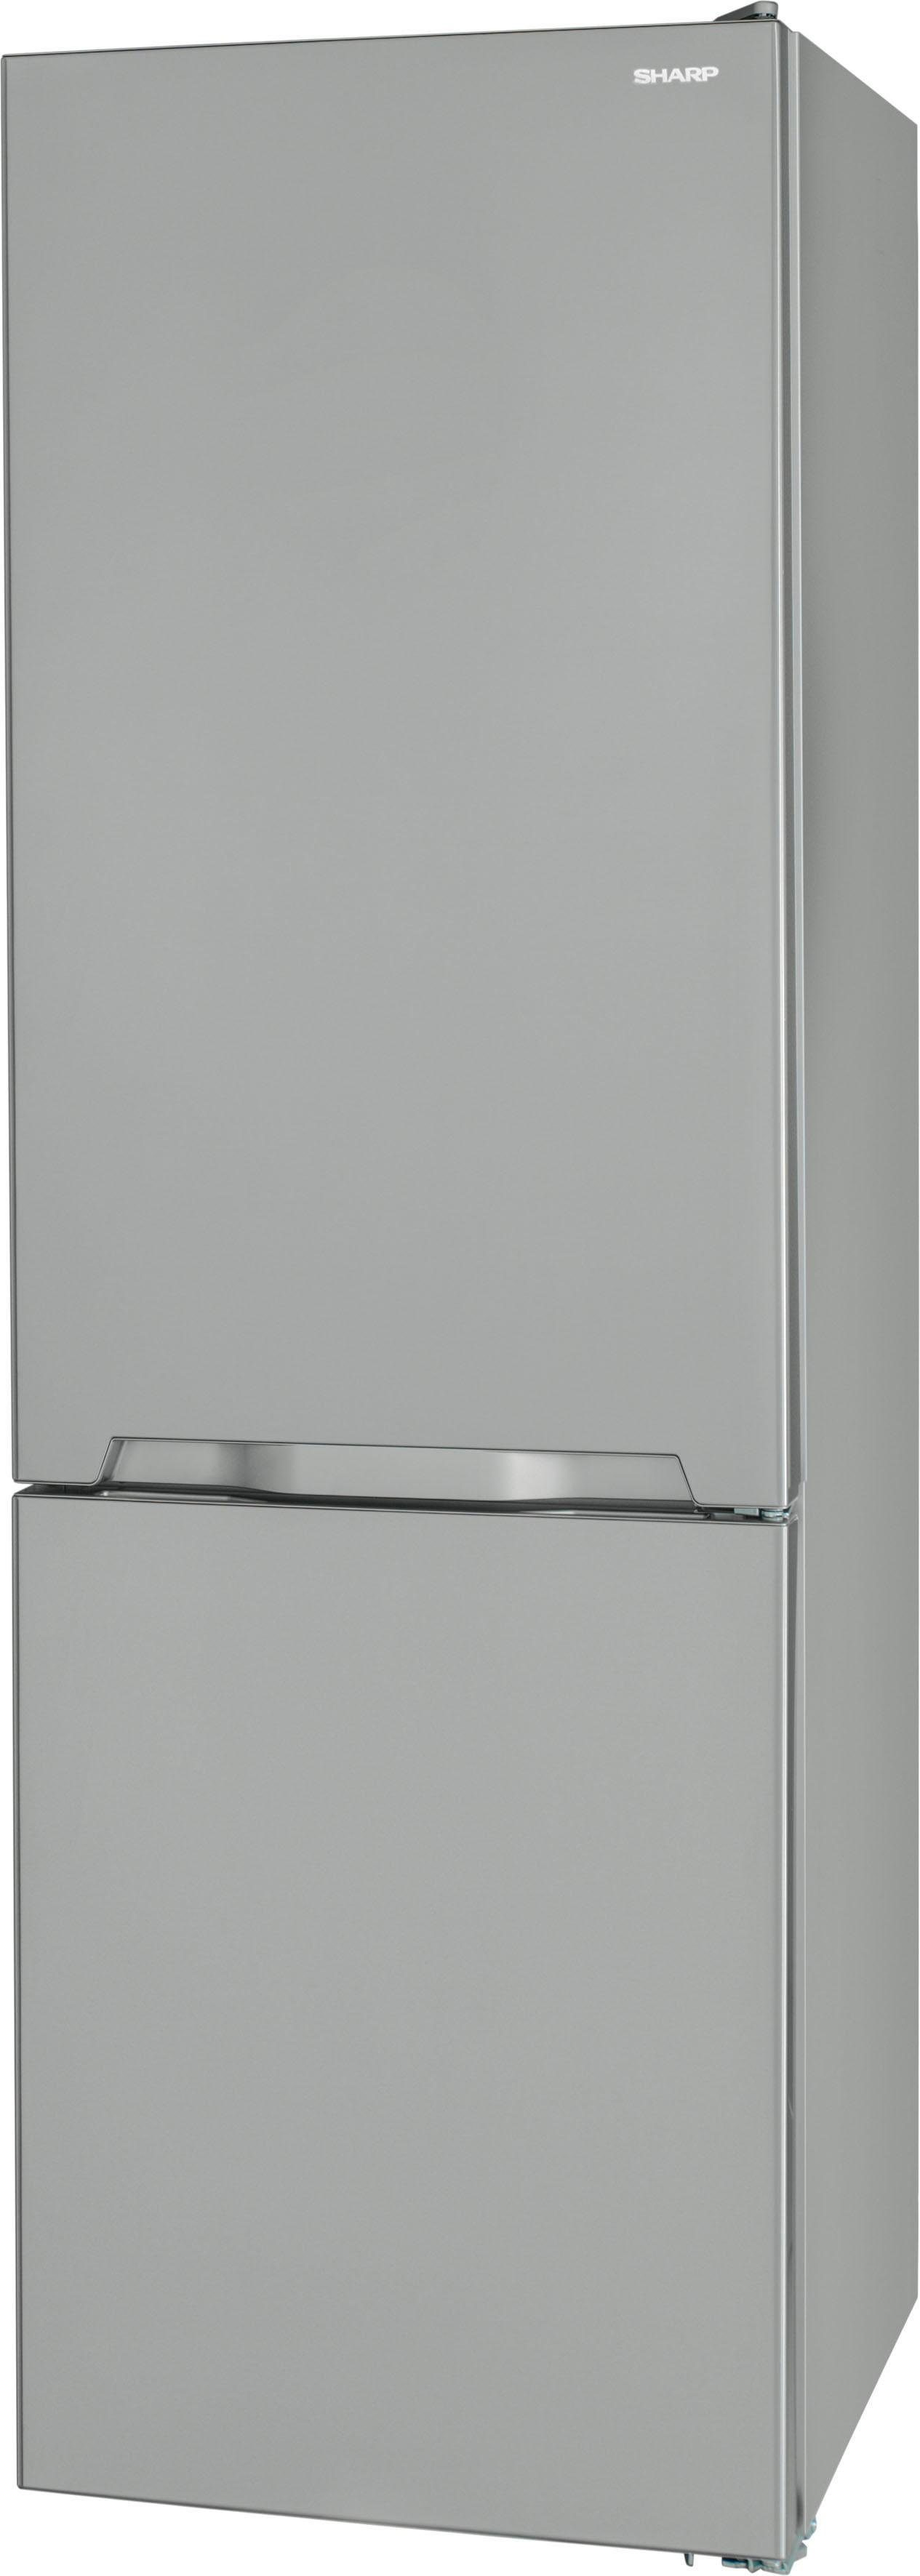 Sharp Kühl-/Gefrierkombination SJ-BA10IMXI2-EU, 186 cm hoch, 59,5 cm breit